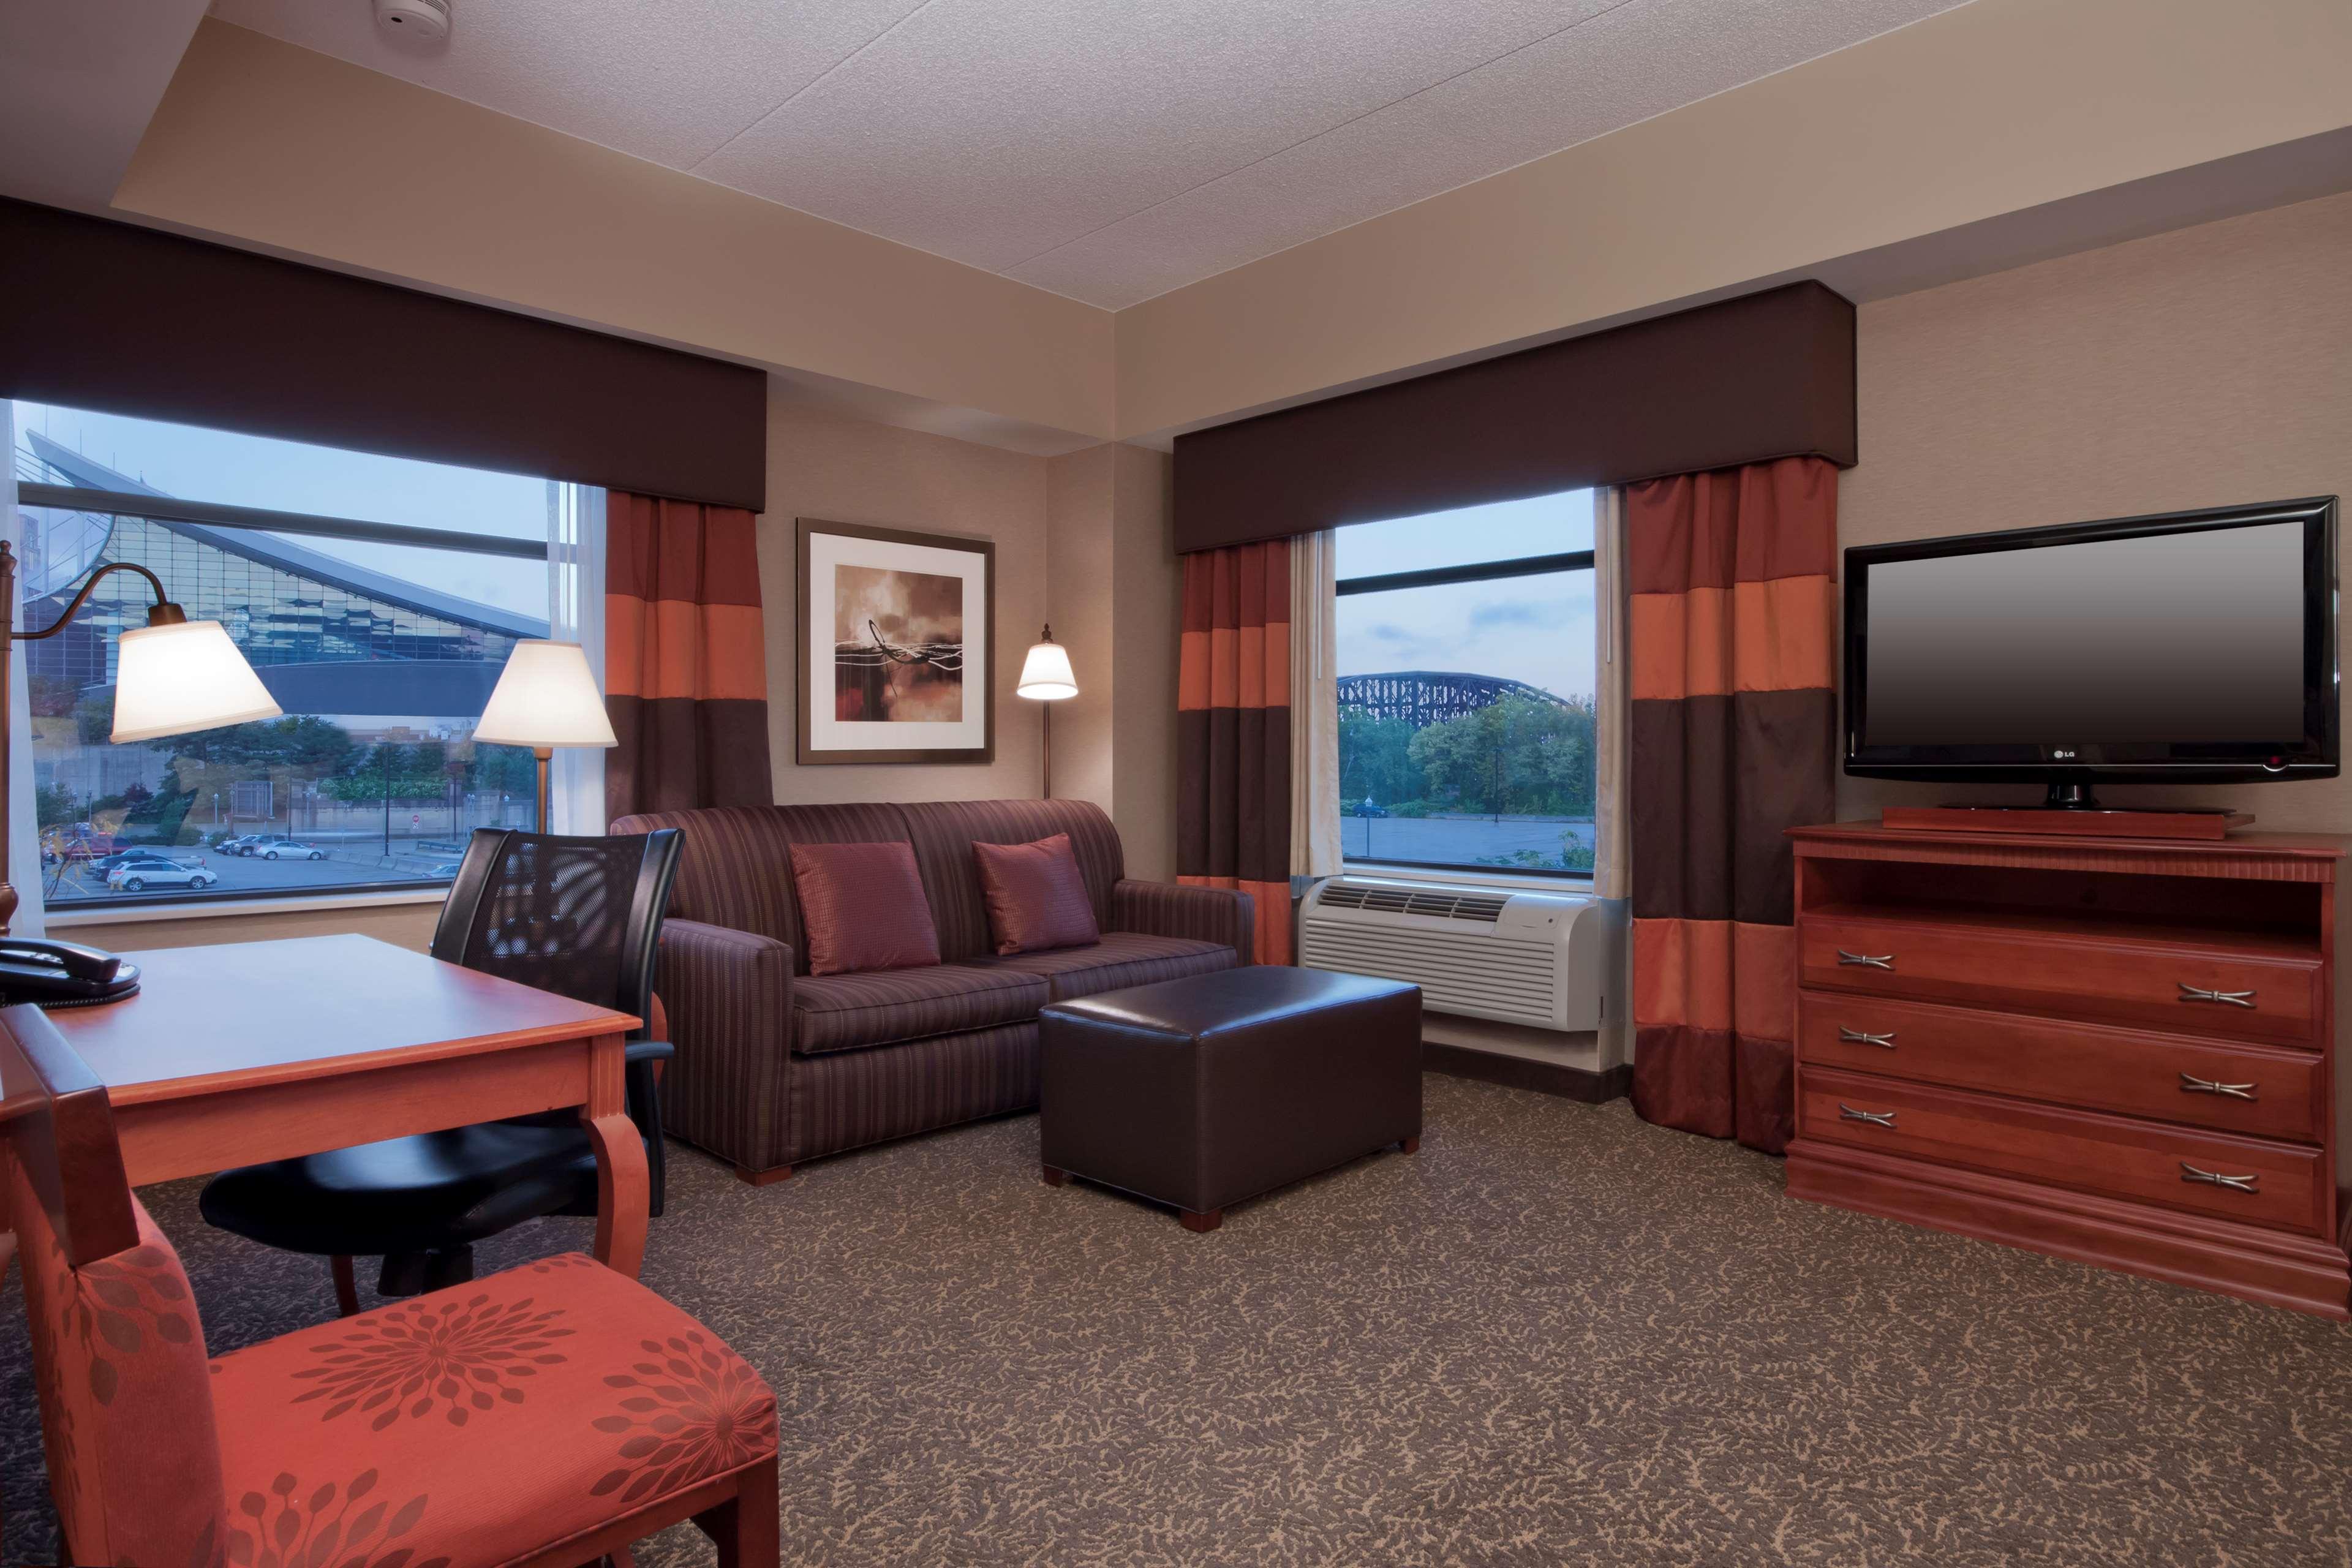 Hampton Inn & Suites Pittsburgh-Downtown image 21